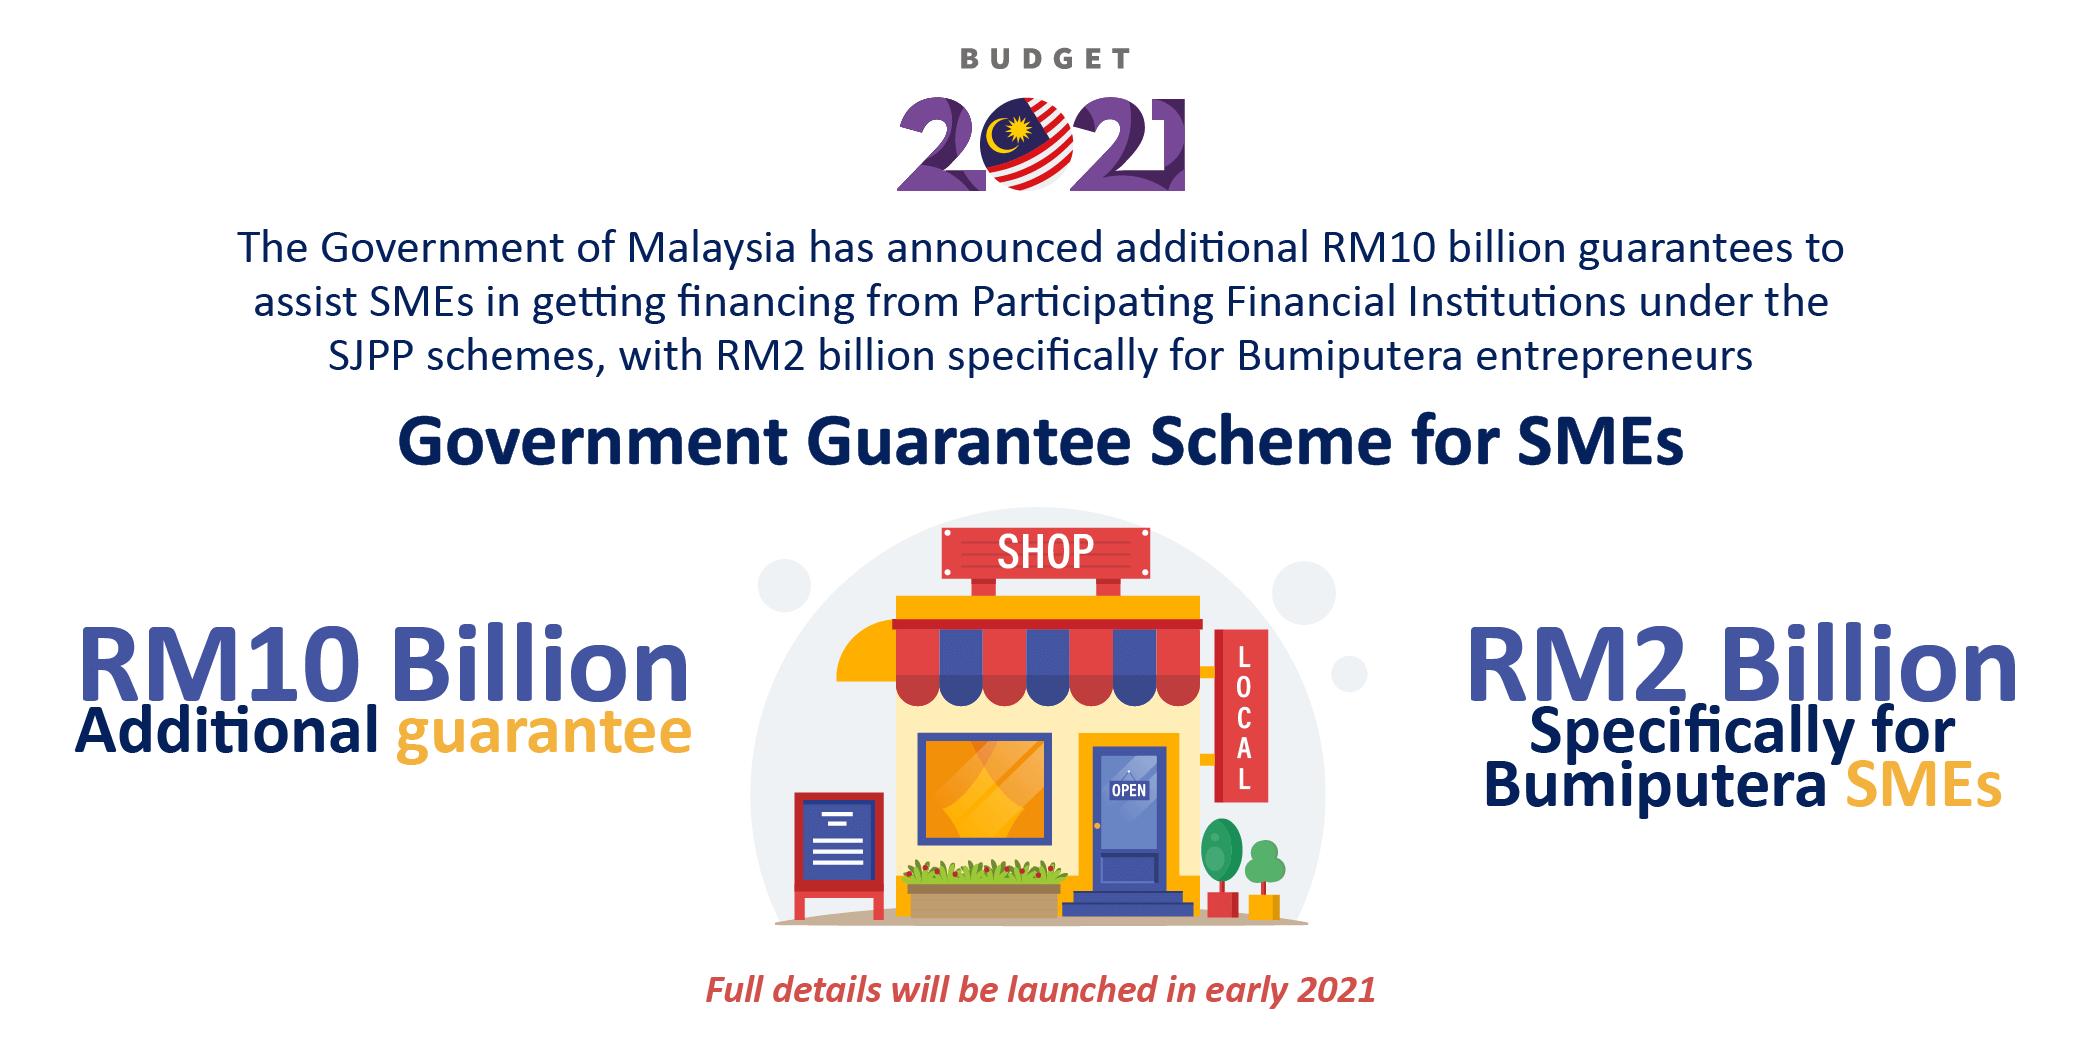 2021 budget government guarantee scheme for smes